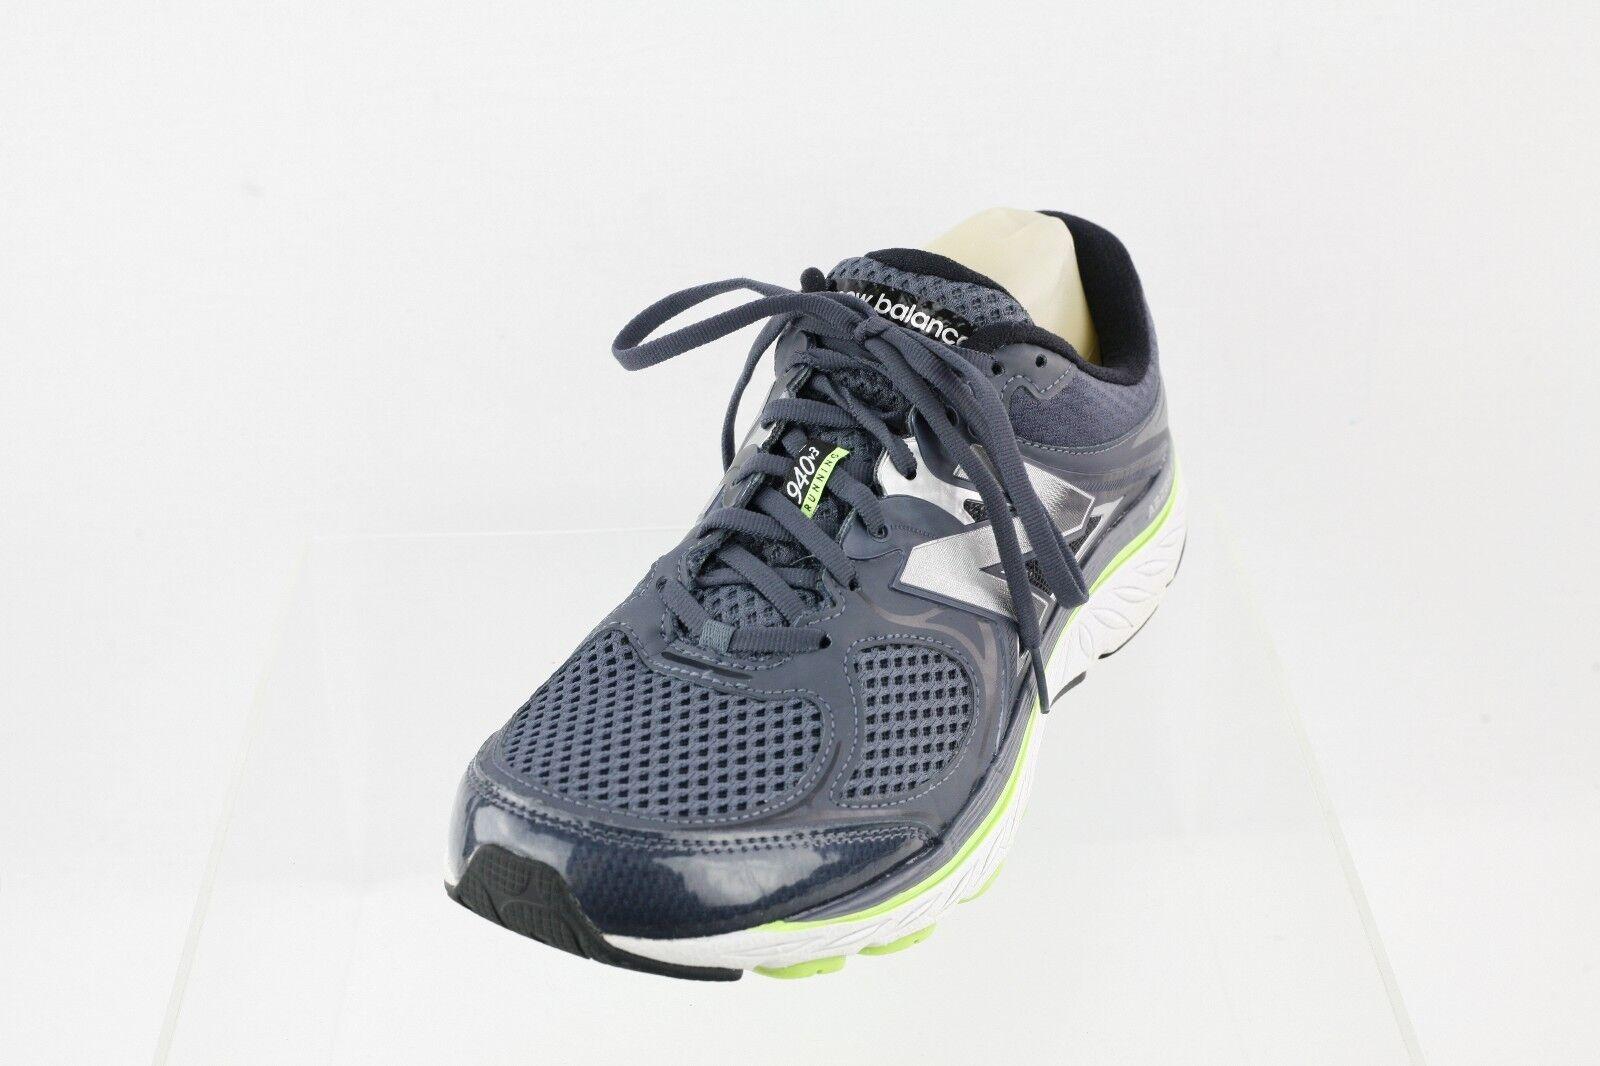 Men's New Balance M940BG3 Grey Lace-up Running Athletic shoes Size 10 M